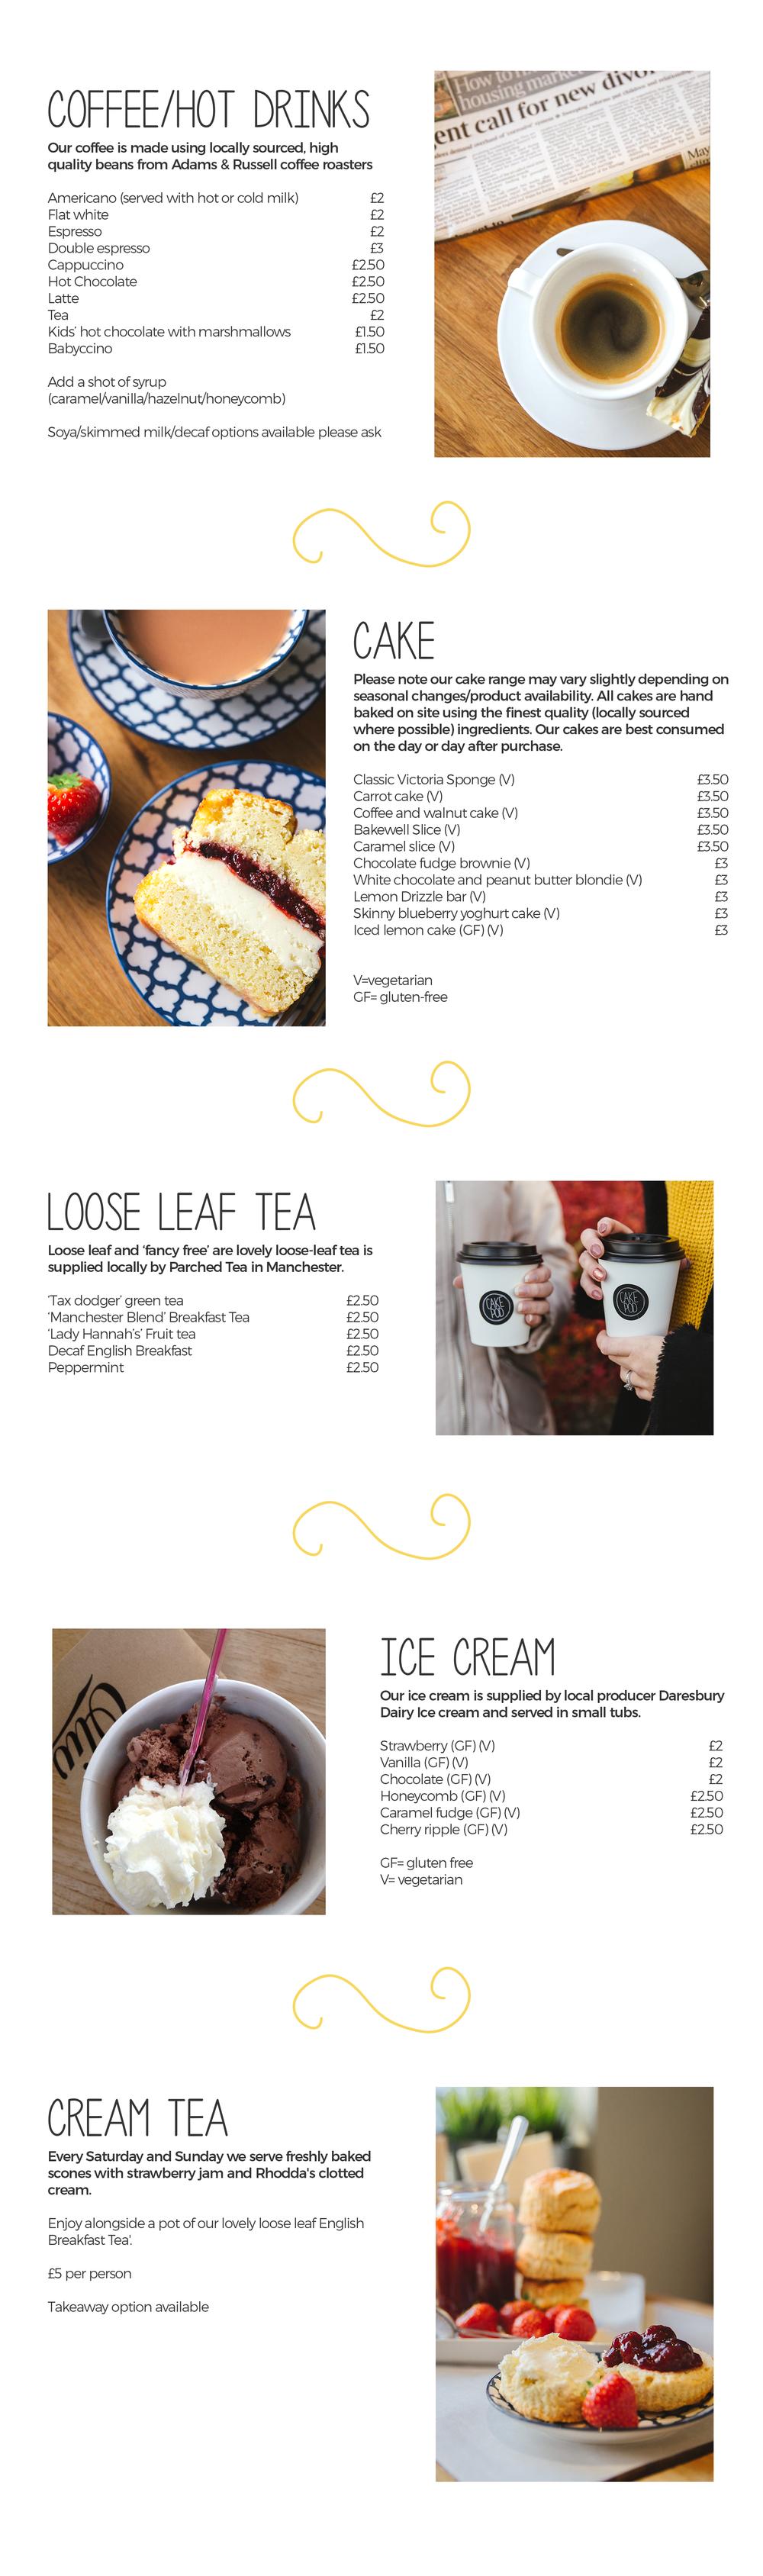 cakepod-menu-section.png